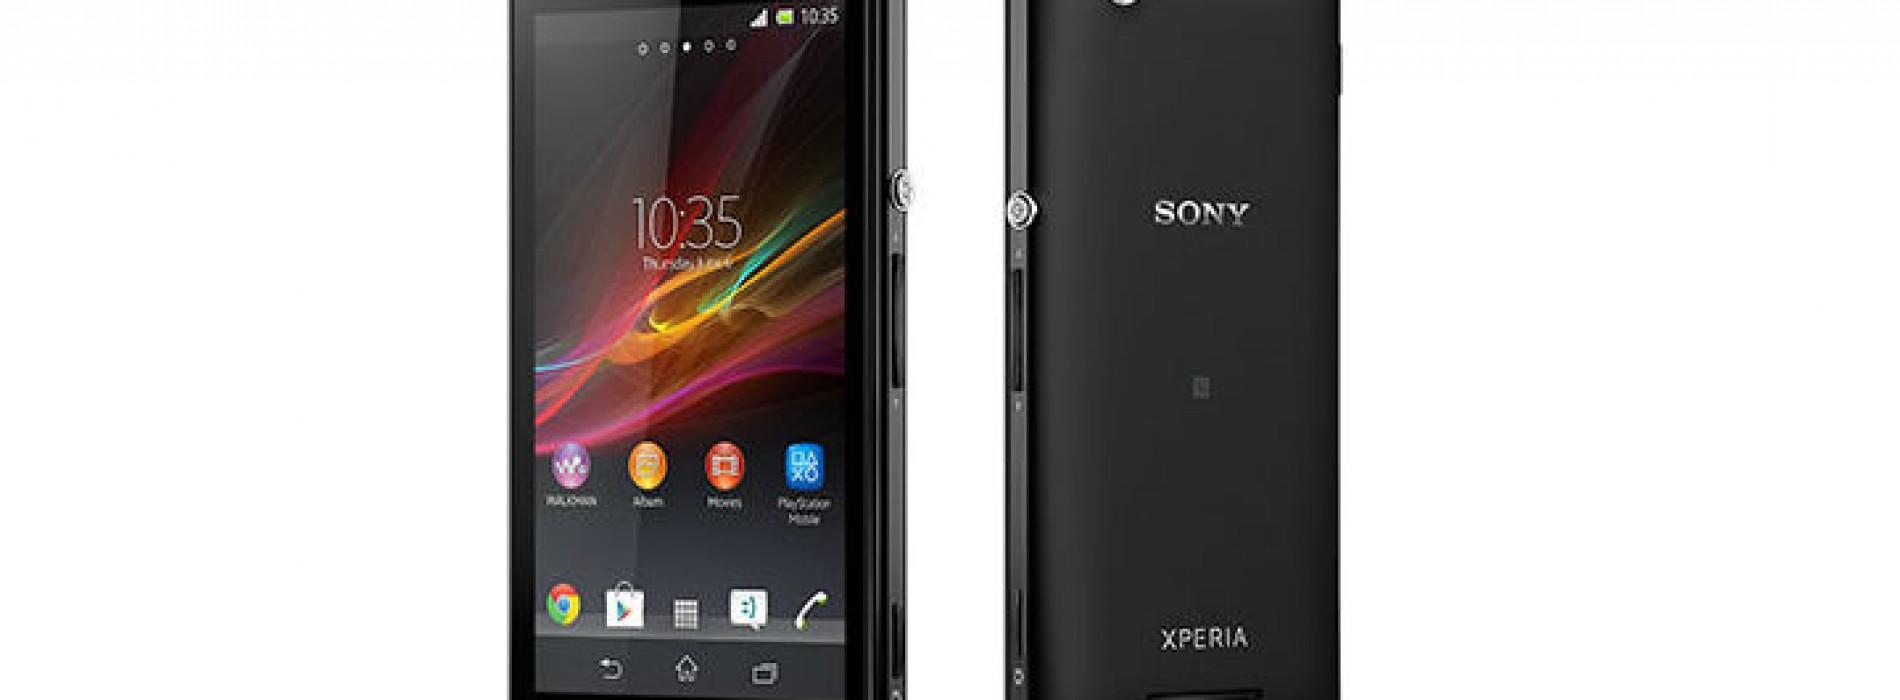 Xperia M joins Sony's smartphone portfolio